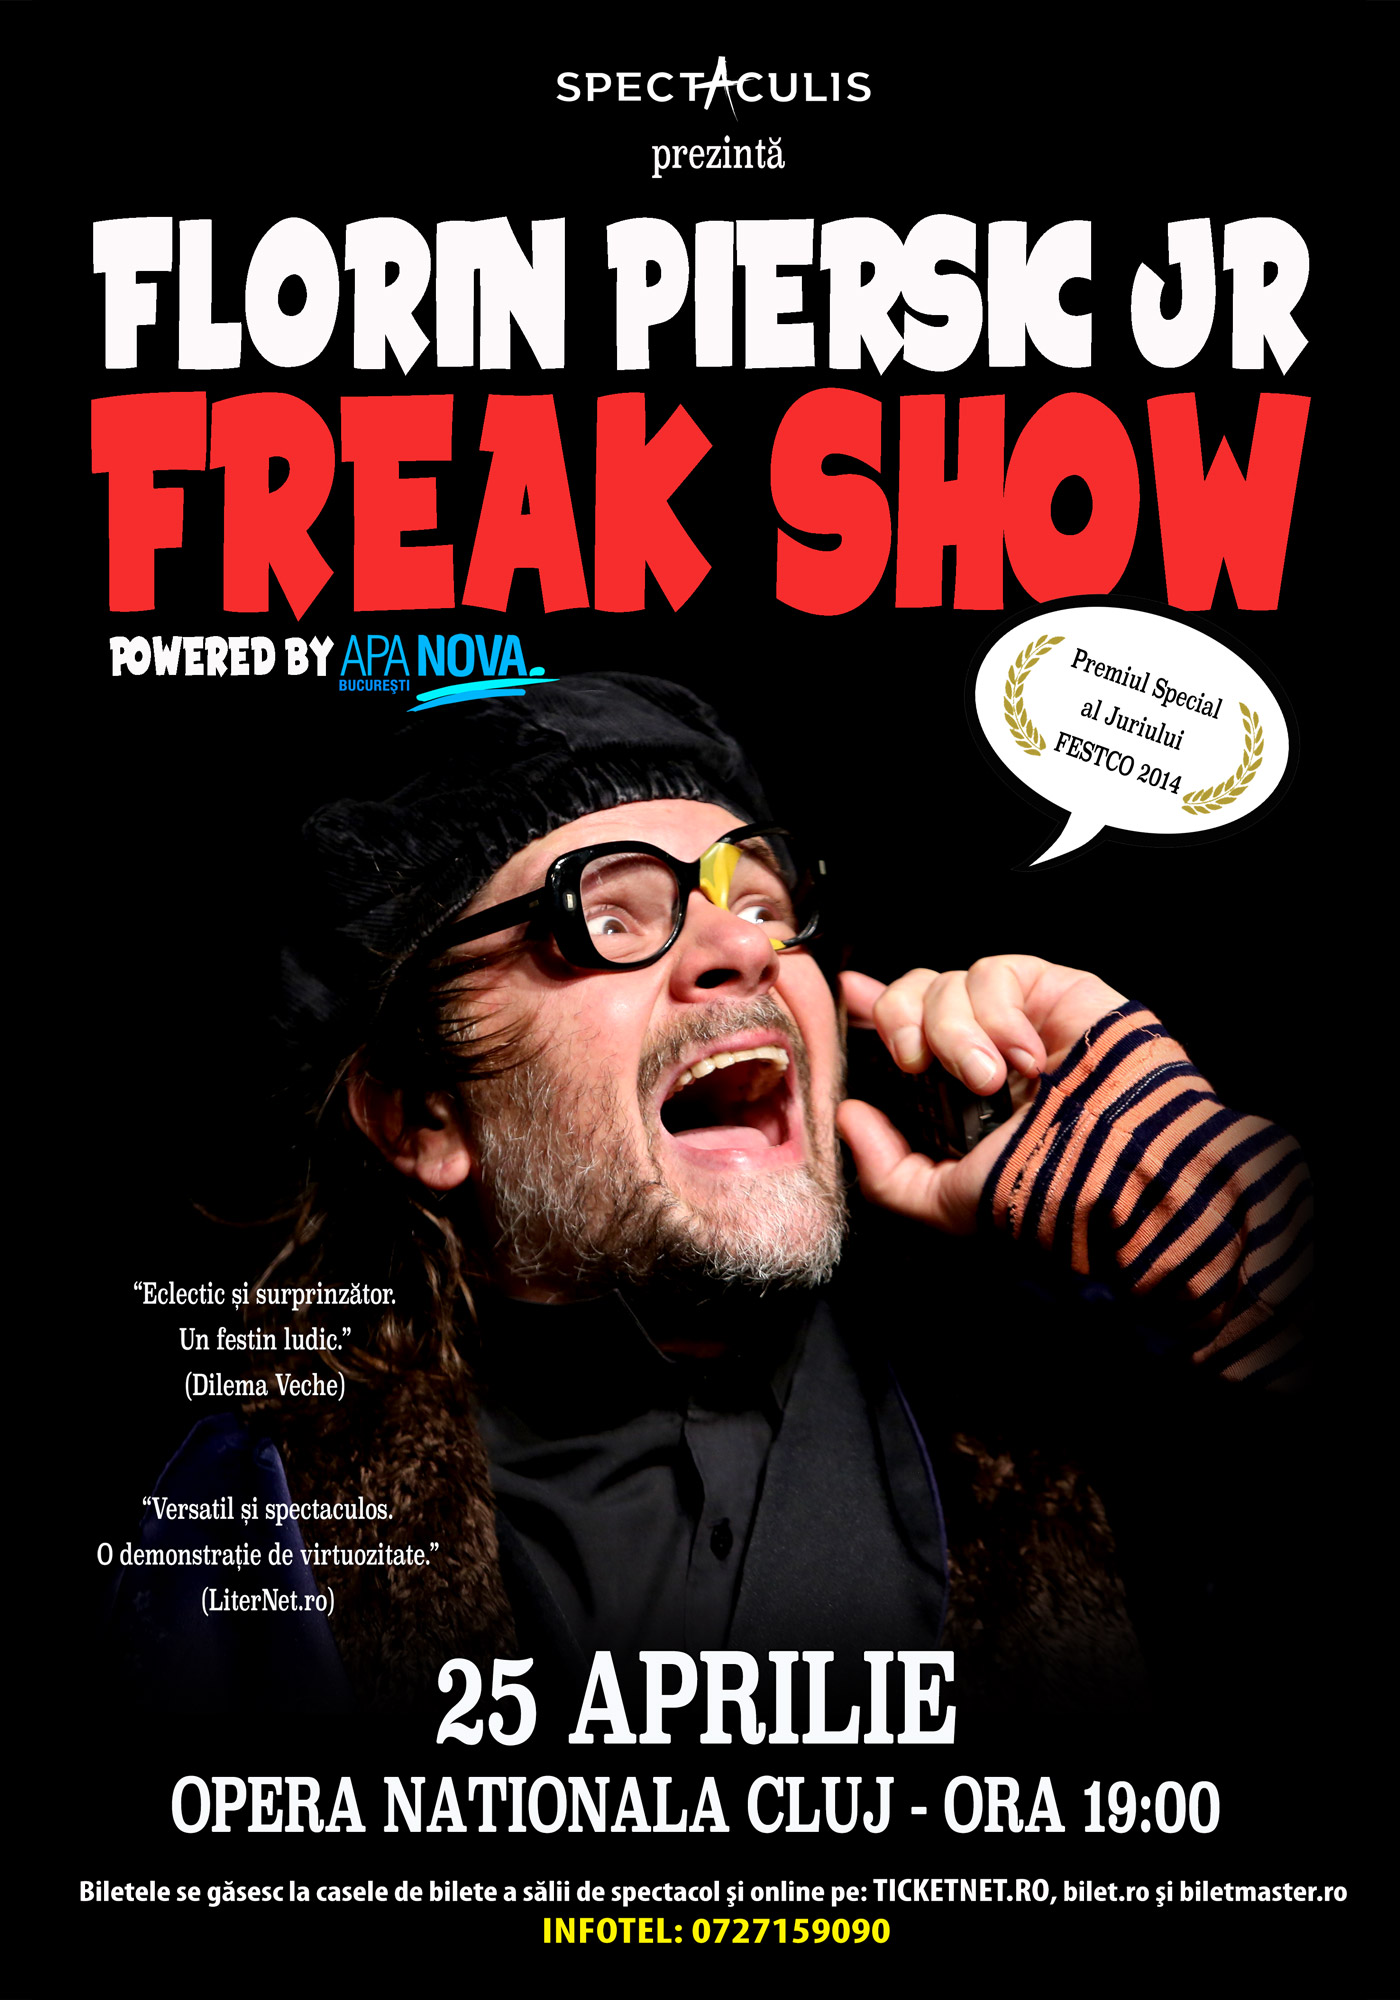 Freak Show cu Florin Piersic Jr